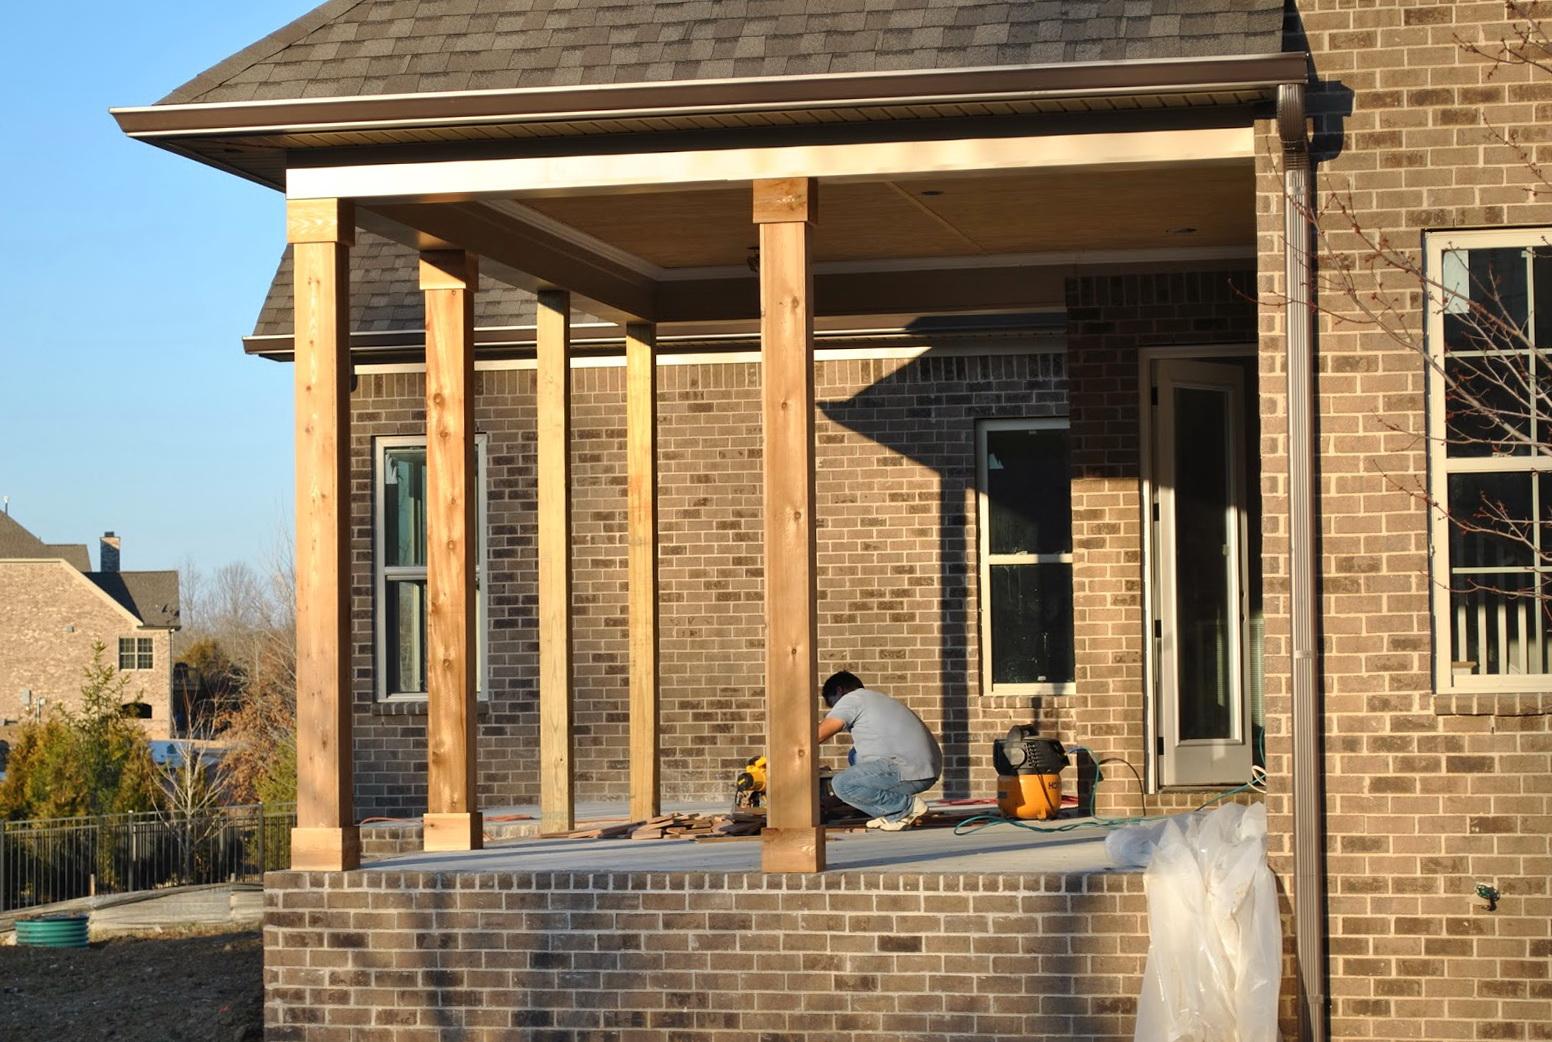 Interior Decorative Columns Lowes Gooding Contractors